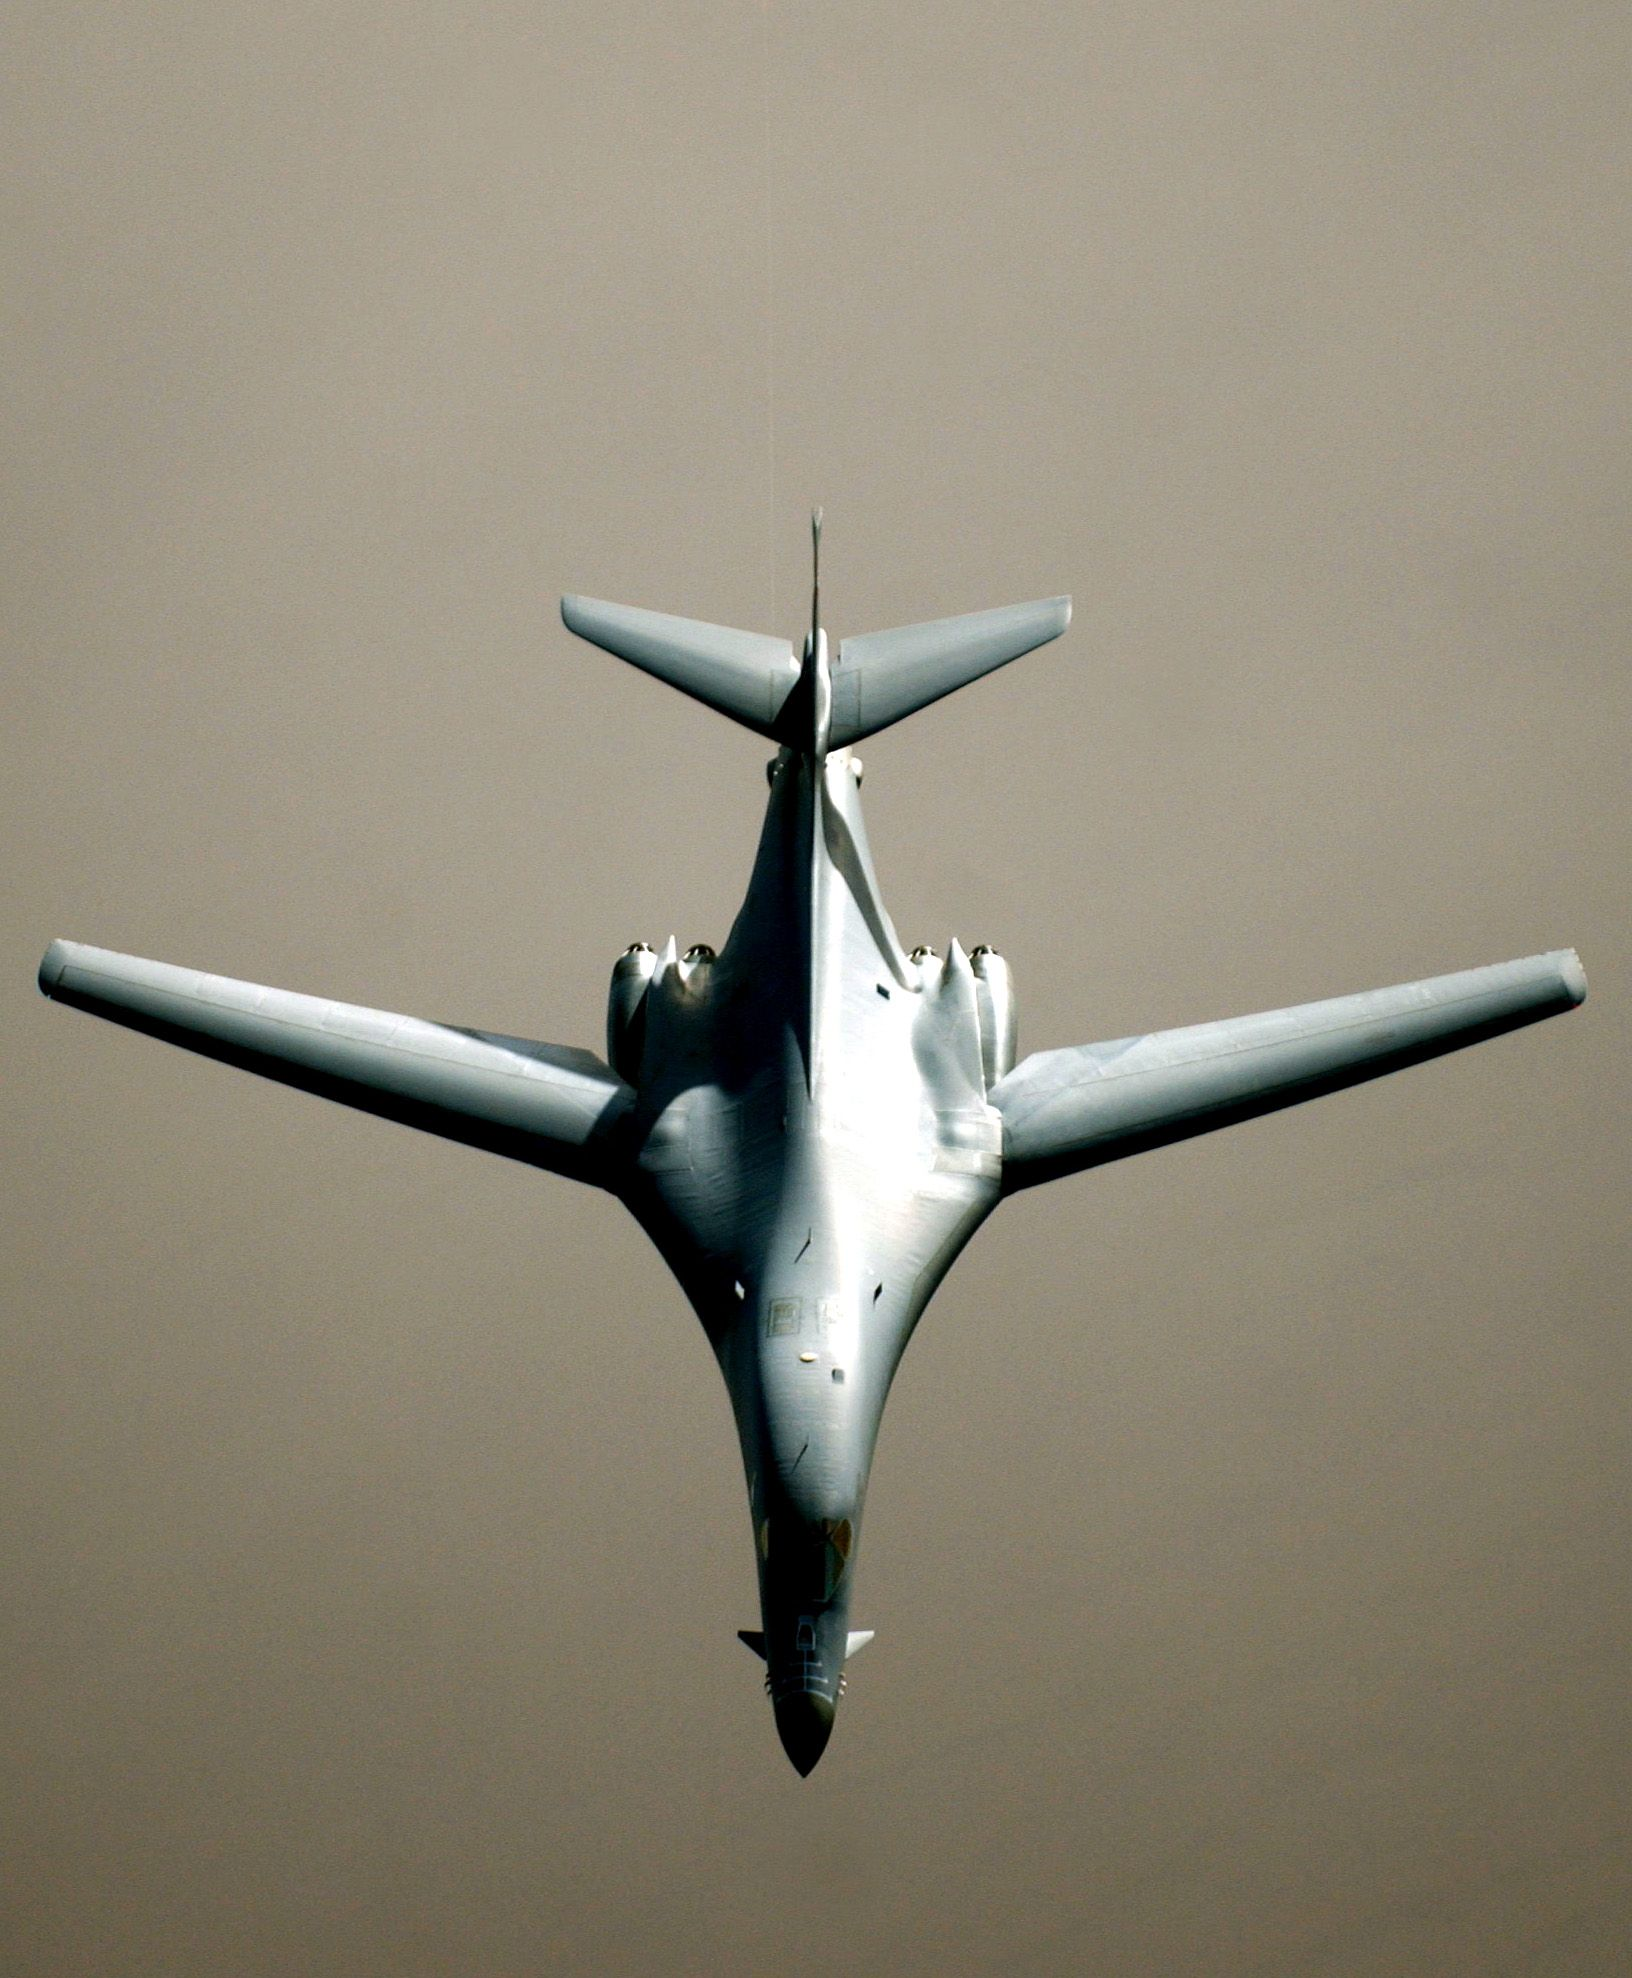 Pin by joe griffitts on aircraft pinterest aircraft aviation